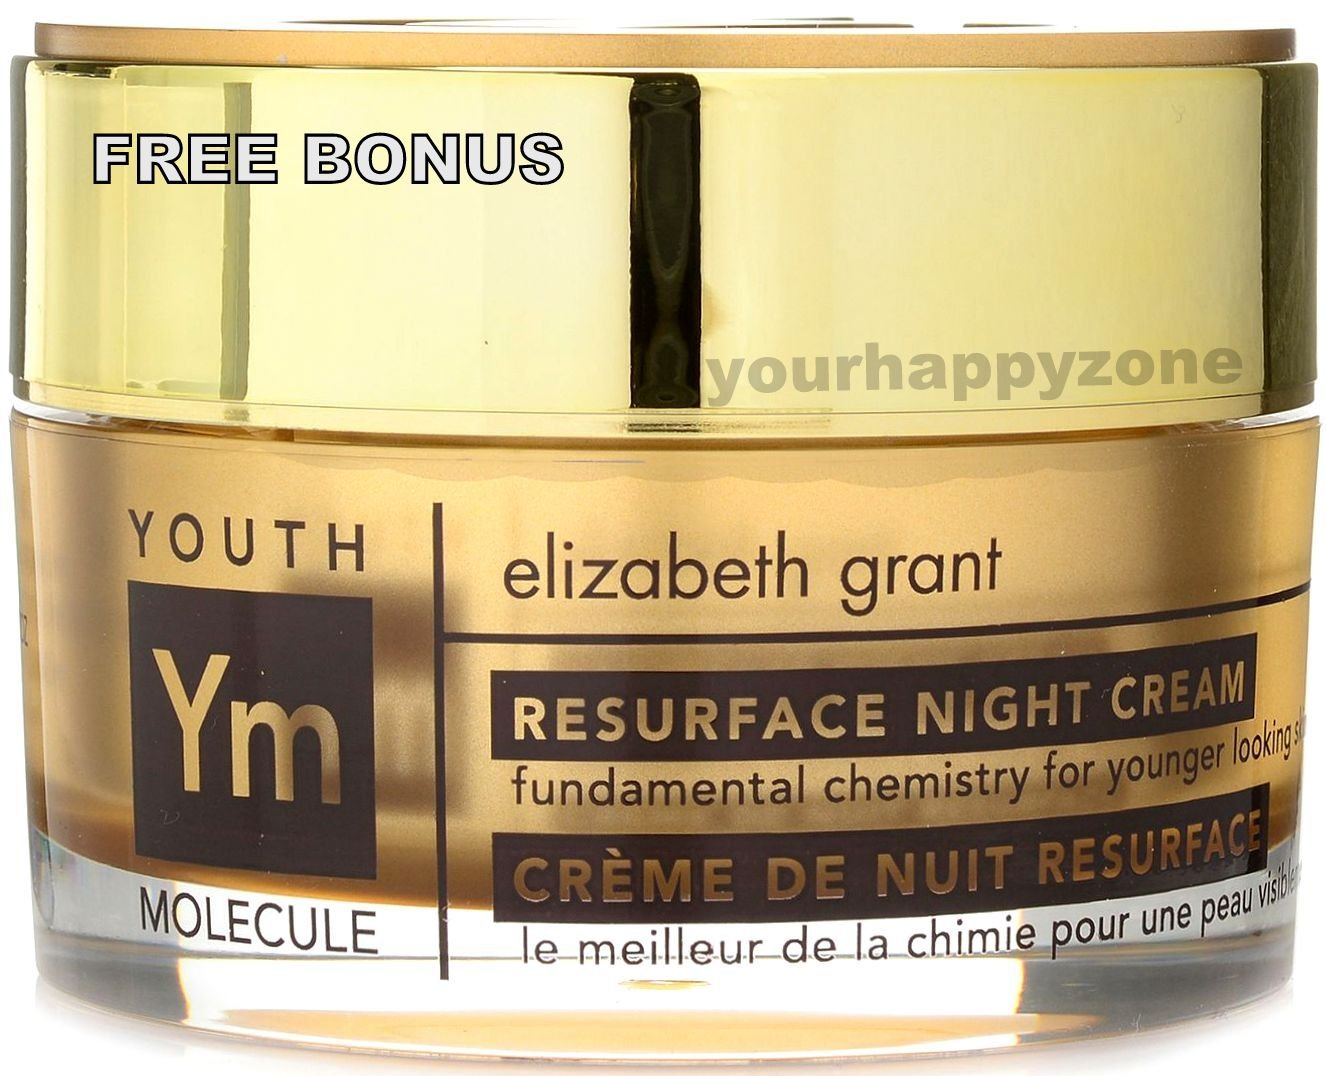 ELIZABETH GRANT Youth Molecule Resurface Night Cream 1.7 oz. with BONUS